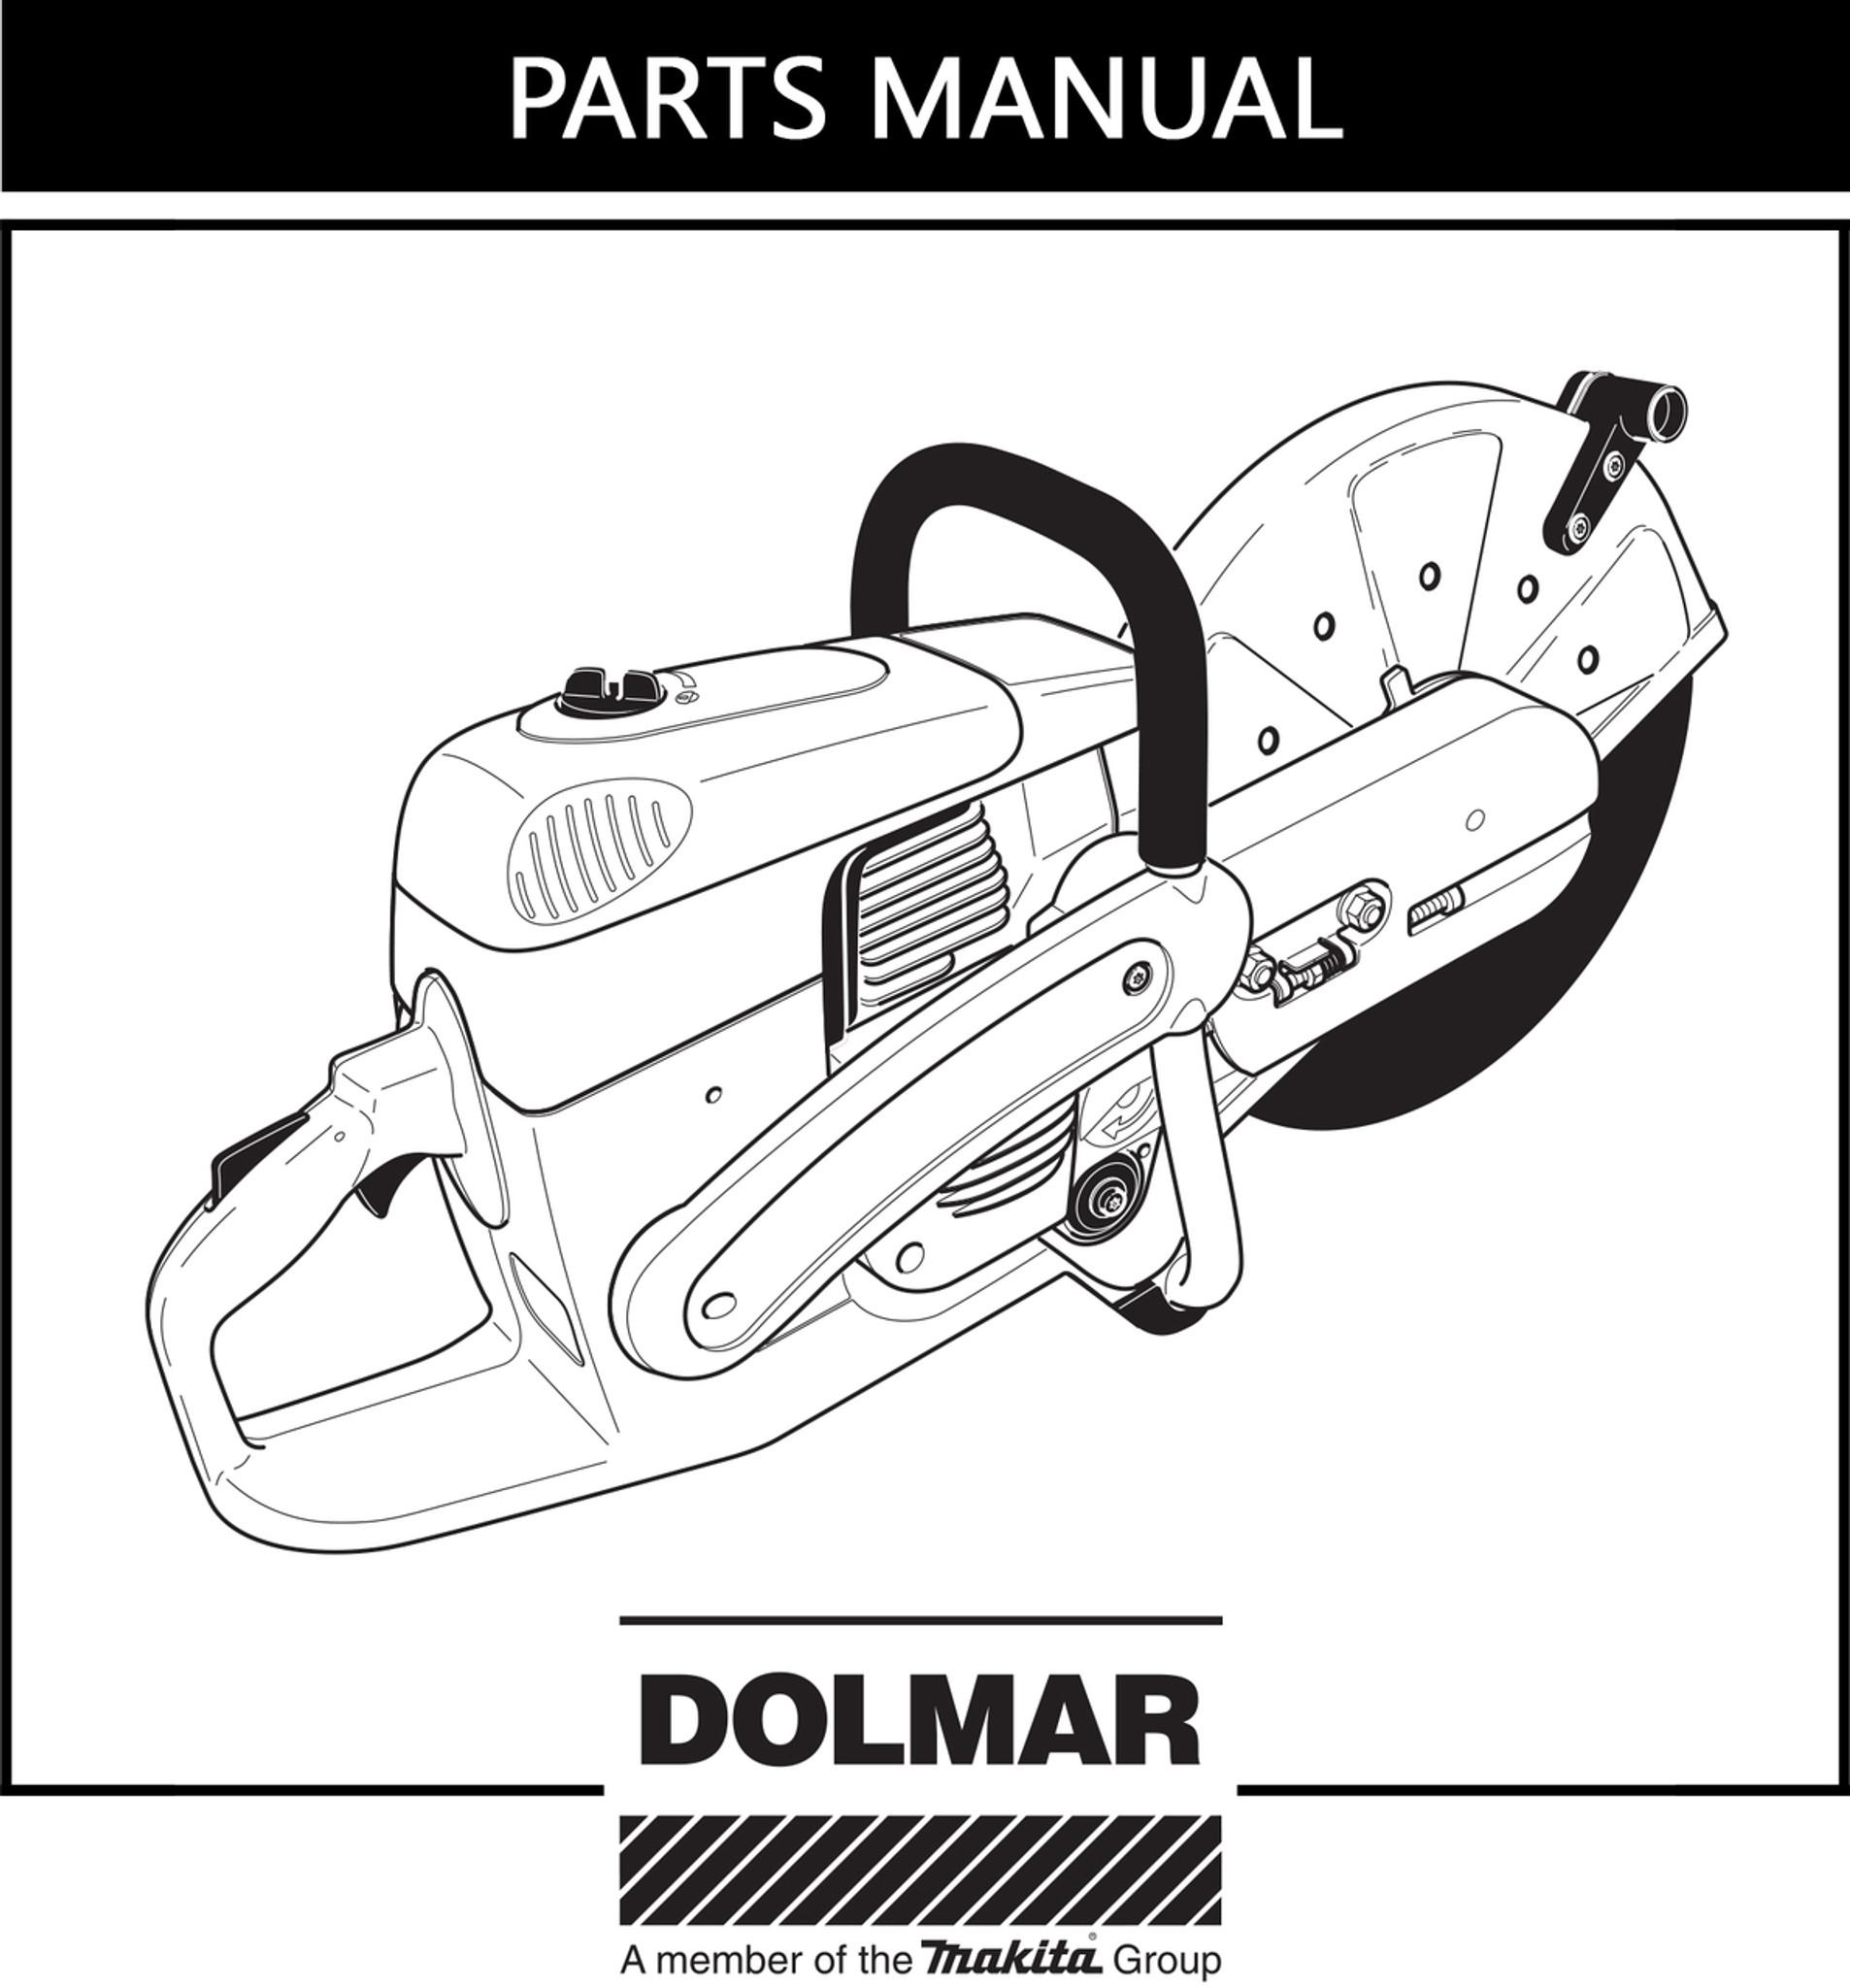 Parts Manual | Dolmar PC6414 | Free Download